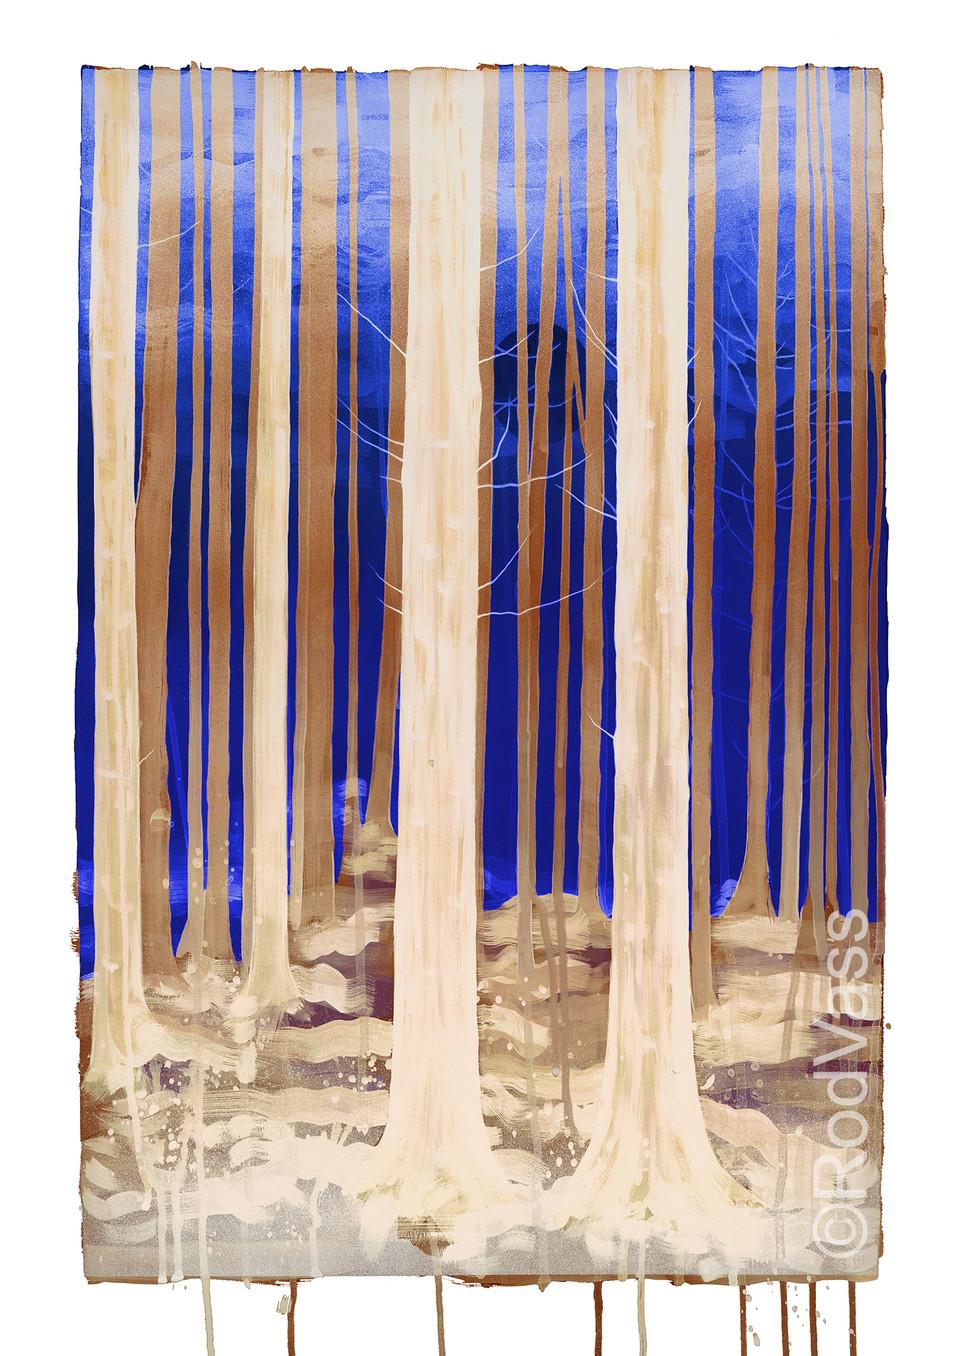 Sapphire Sky - Right panel - By Rod Vass